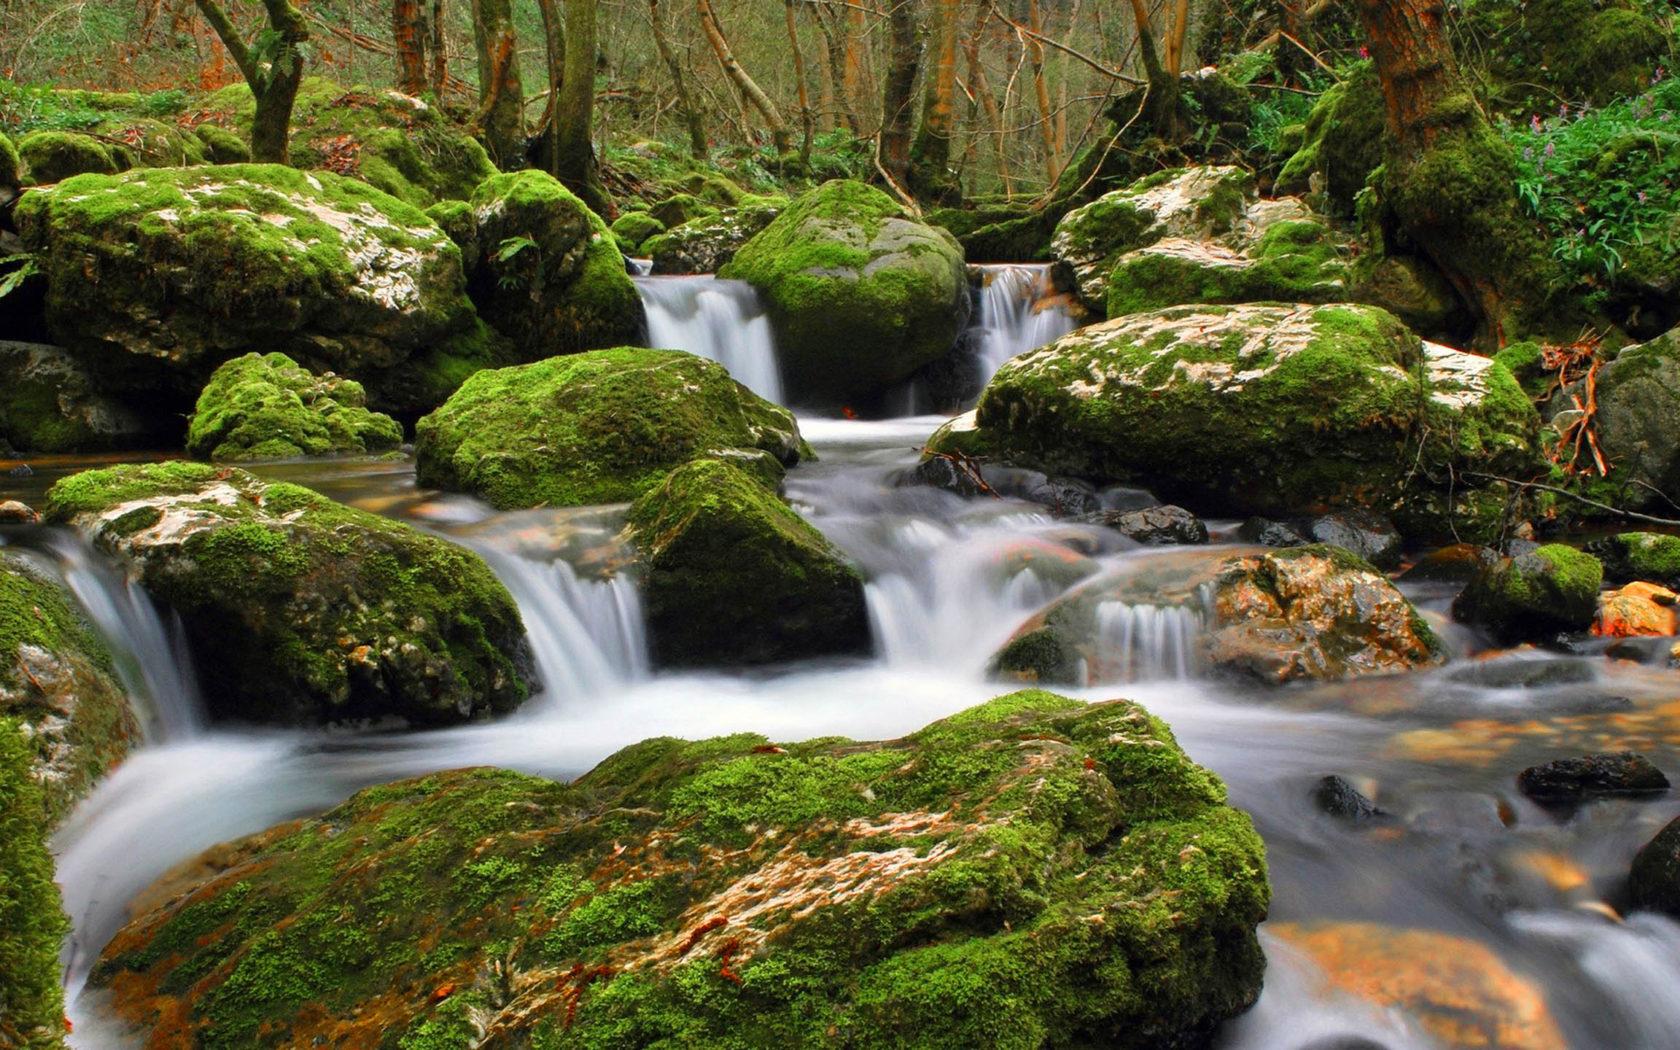 Beautiful Fall Landscape Wallpaper Nature Stream Of Clear Water Flowing Between Rocks Moss